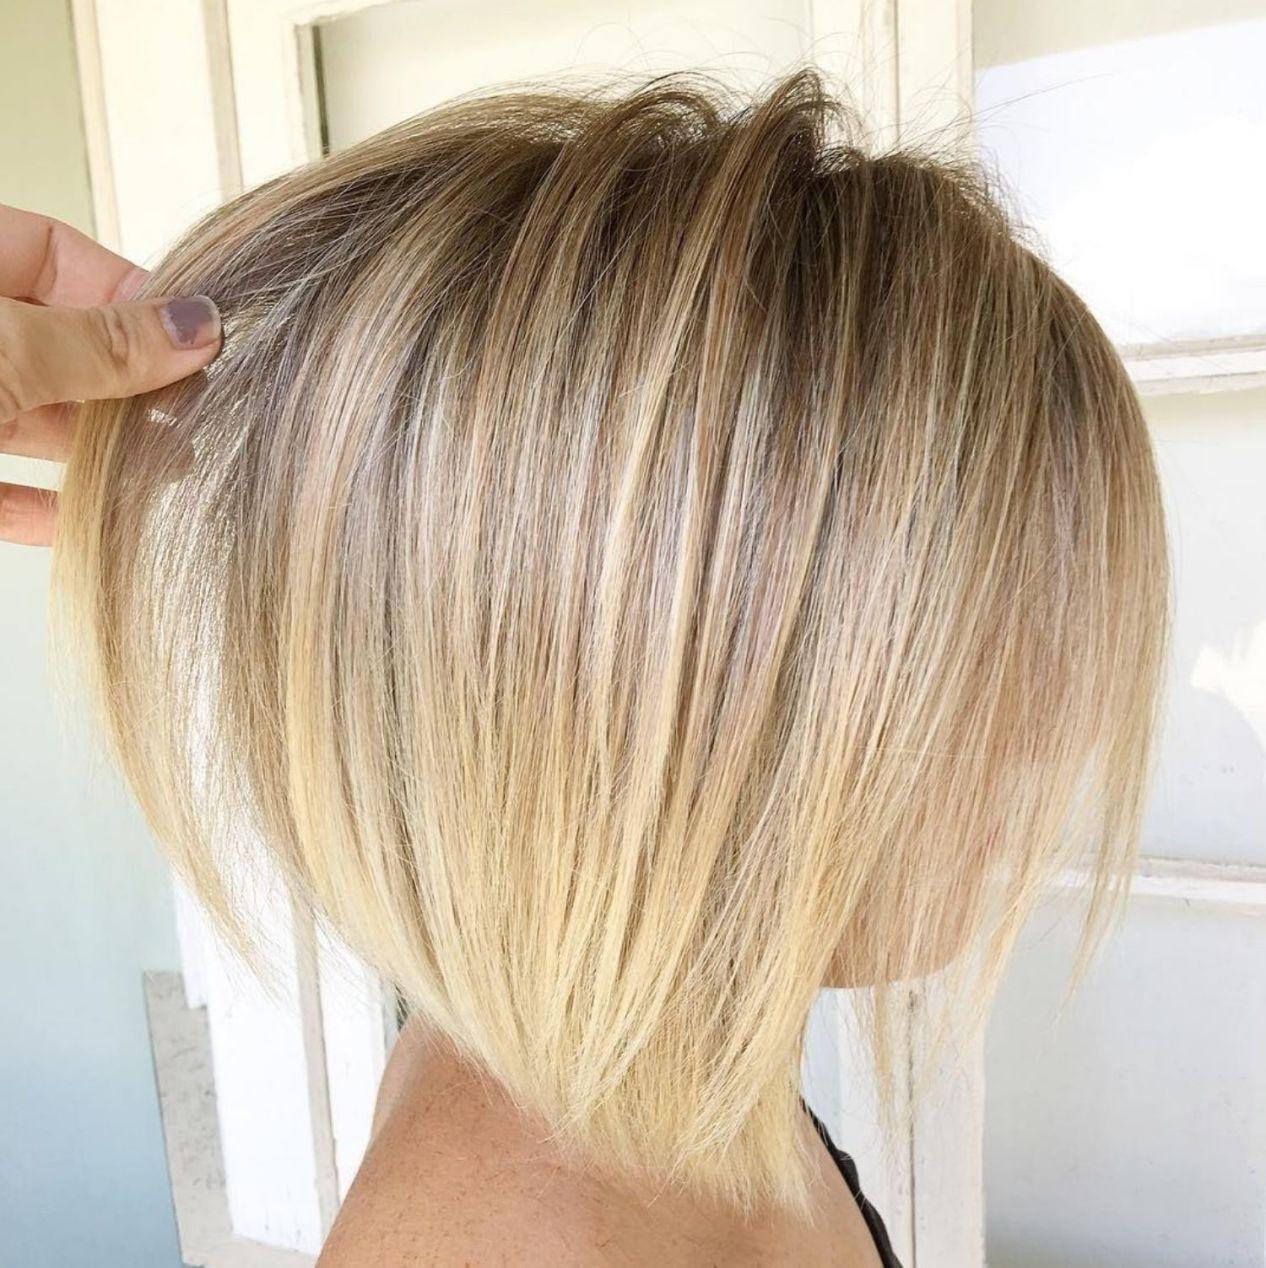 Voluminous Rounded Bronde Bob Thin Hair Haircuts Hair Styles Hairstyles For Thin Hair